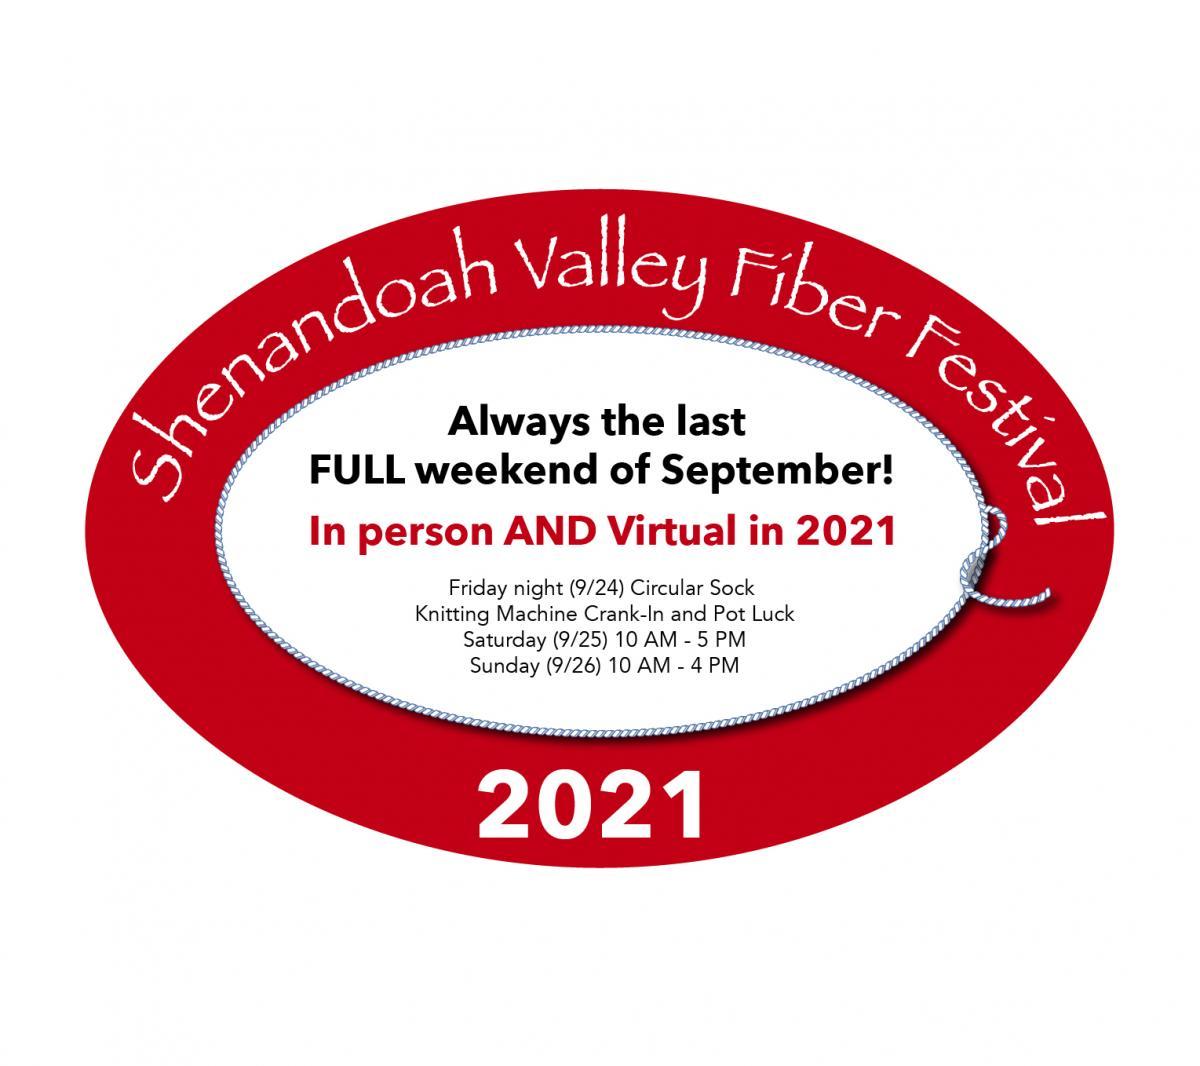 2021 Shenandoah Valley Fiber Festival